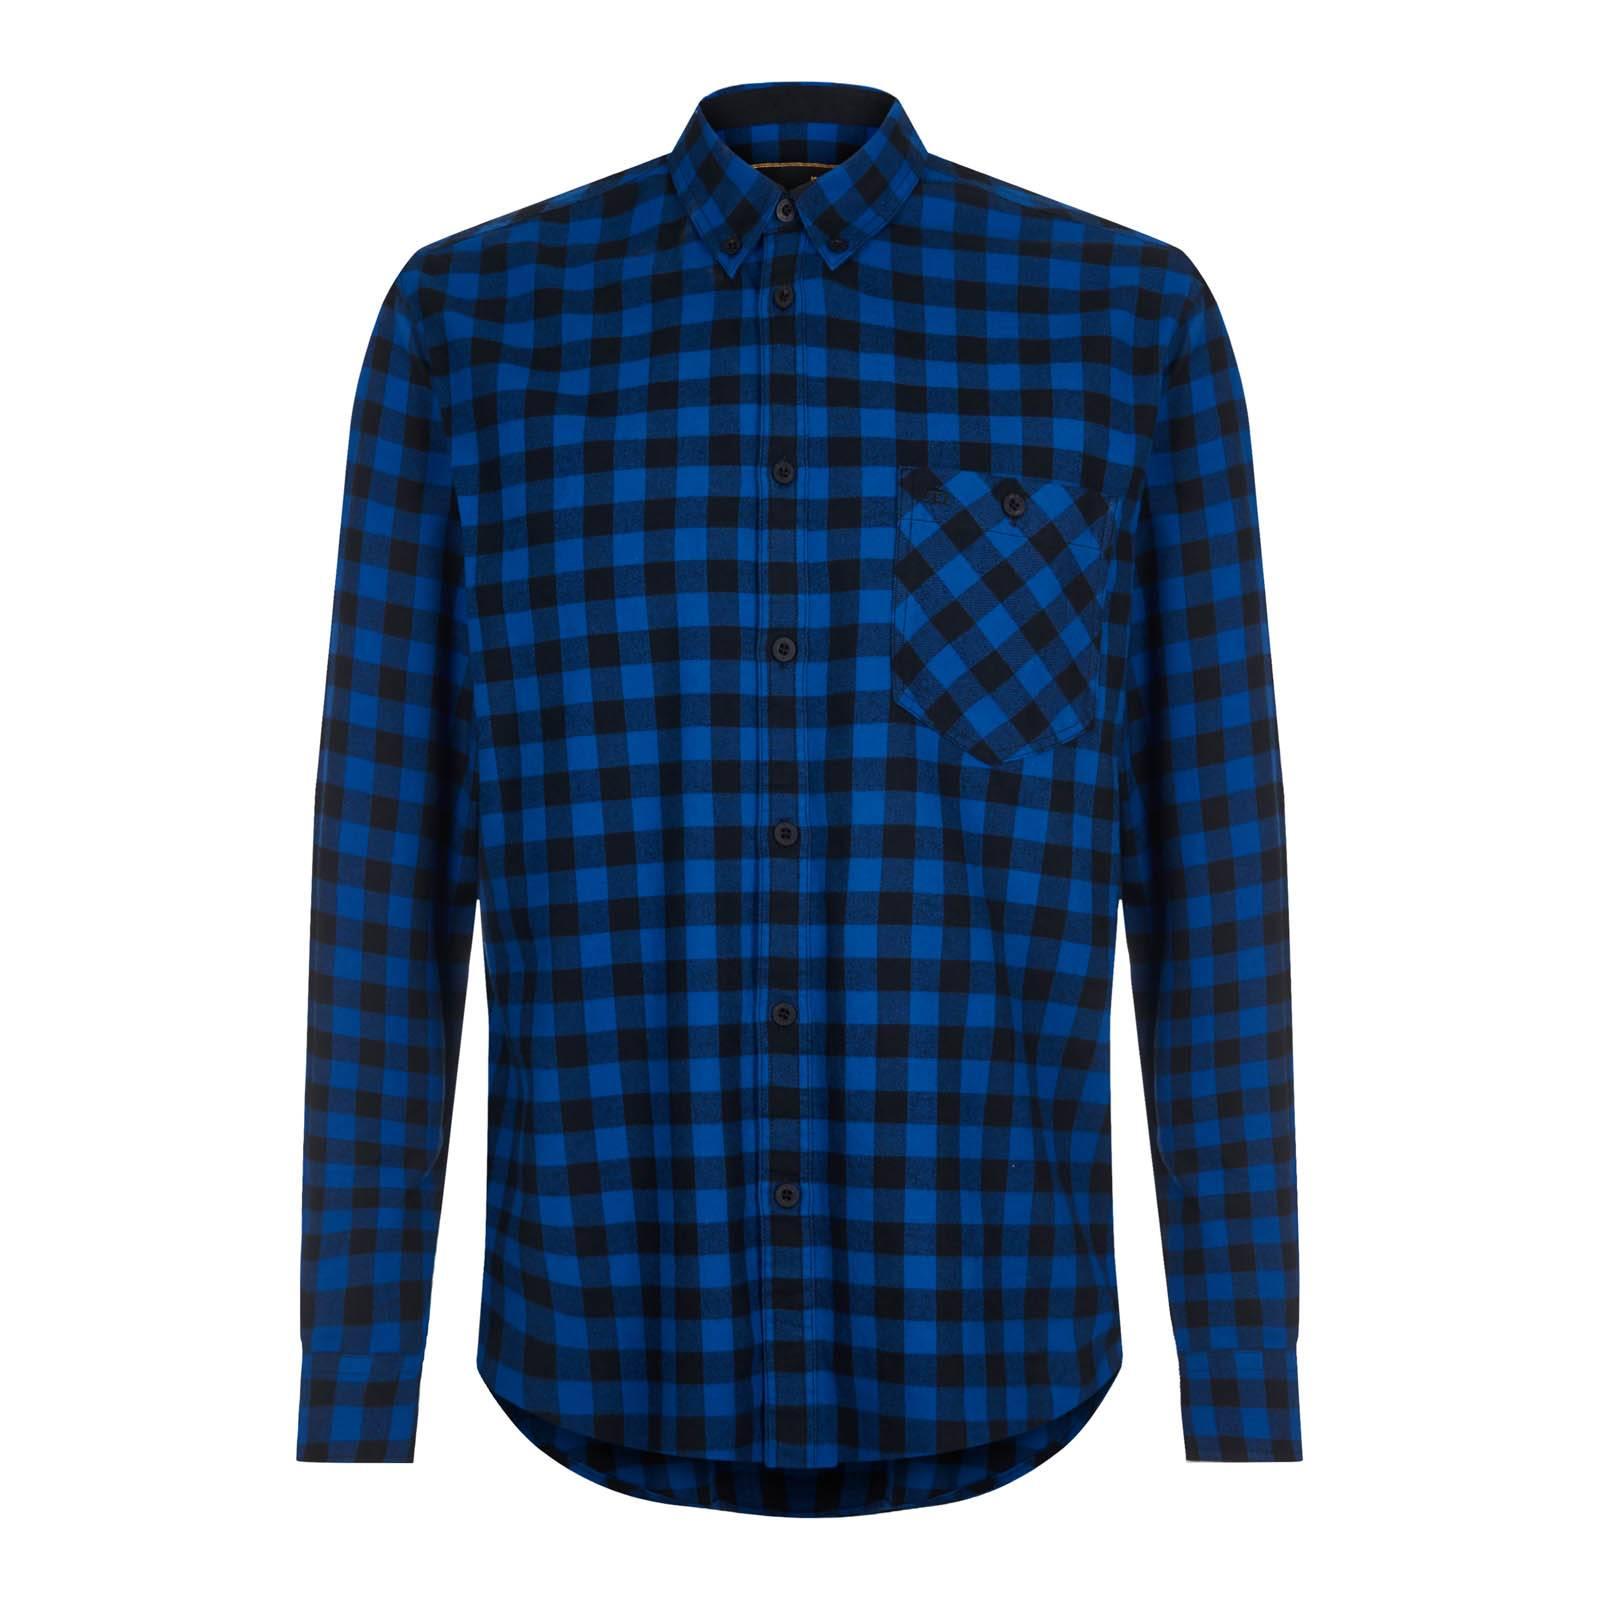 Рубашка FoxhillСлайдер на главной<br><br><br>Артикул: 1516212<br>Материал: 100% хлопок<br>Цвет: синий<br>Пол: Мужской